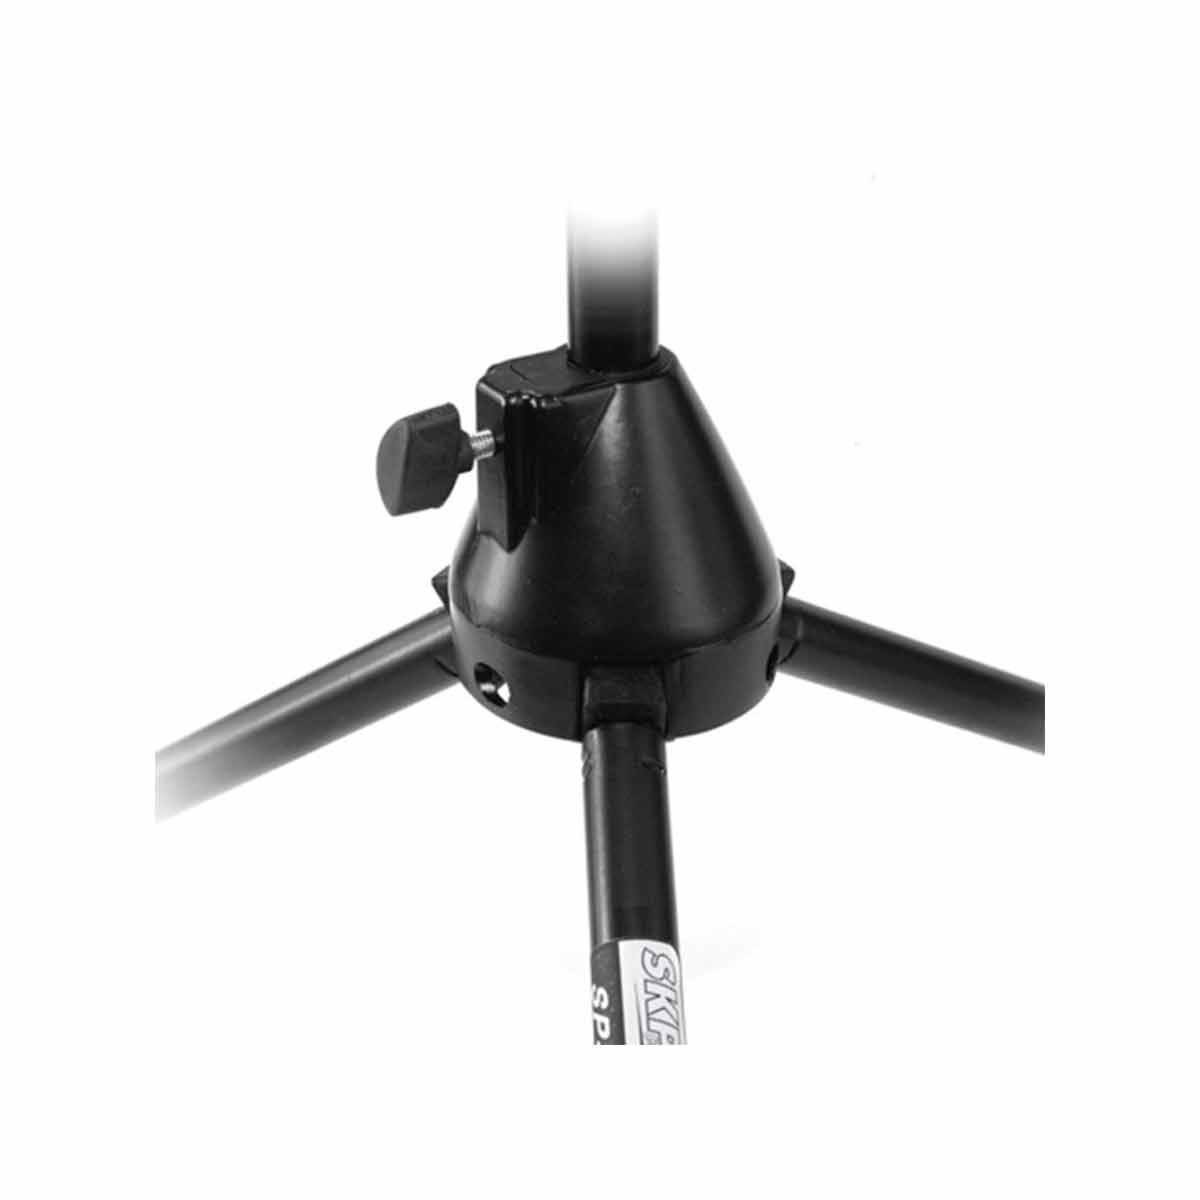 Pedestal p/ Microfone tipo Girafa SP 20 - SKP